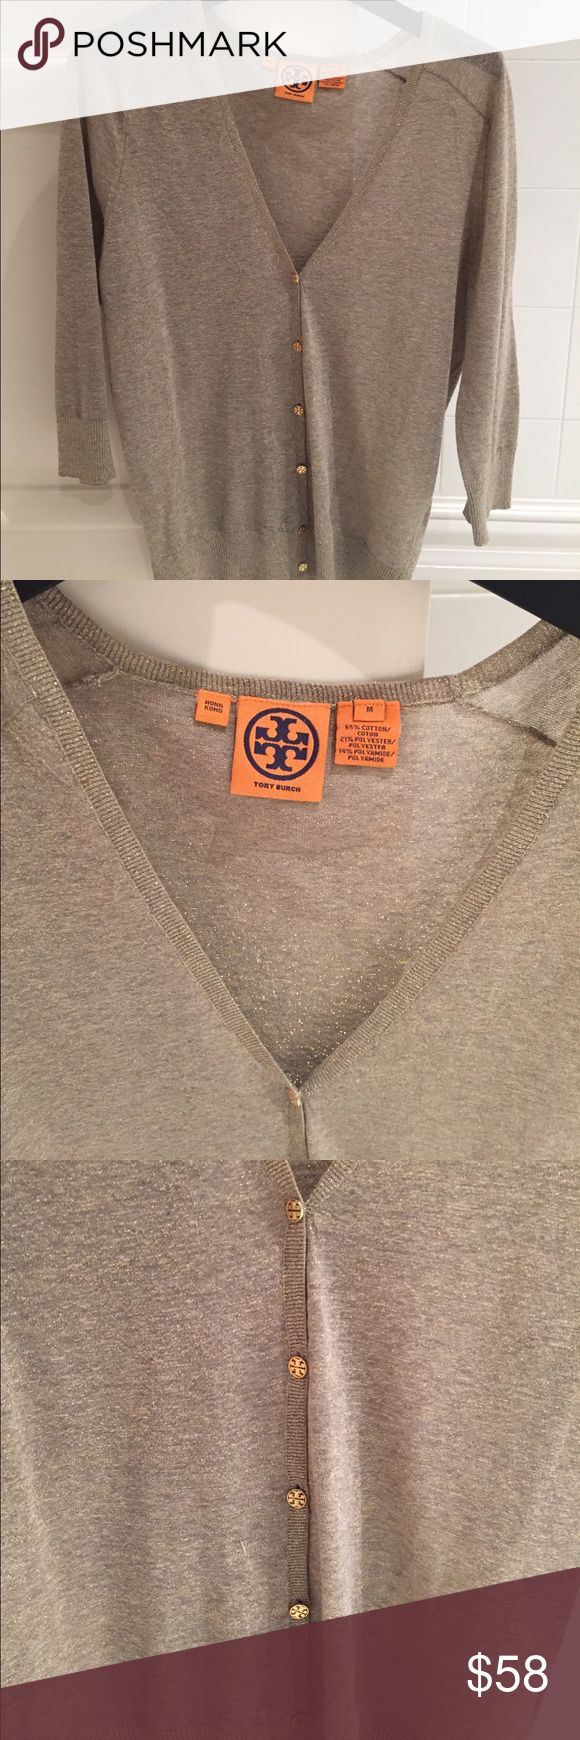 Tory Burch silver cardigan - size medium Tory Burch silver cardigan - size medium. Gold logo buttons. Elbow length. Tory Burch Sweaters Cardigans